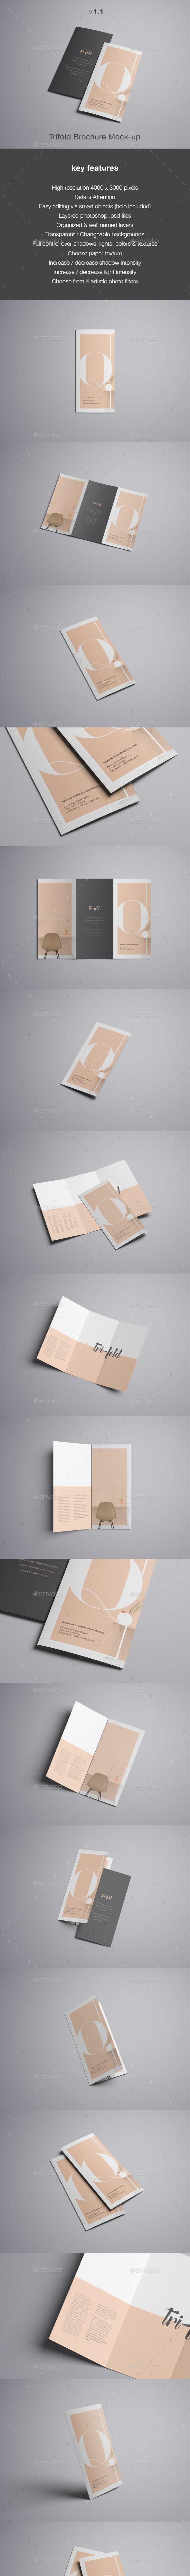 Trifold Brochure Mockup - Brochures Print